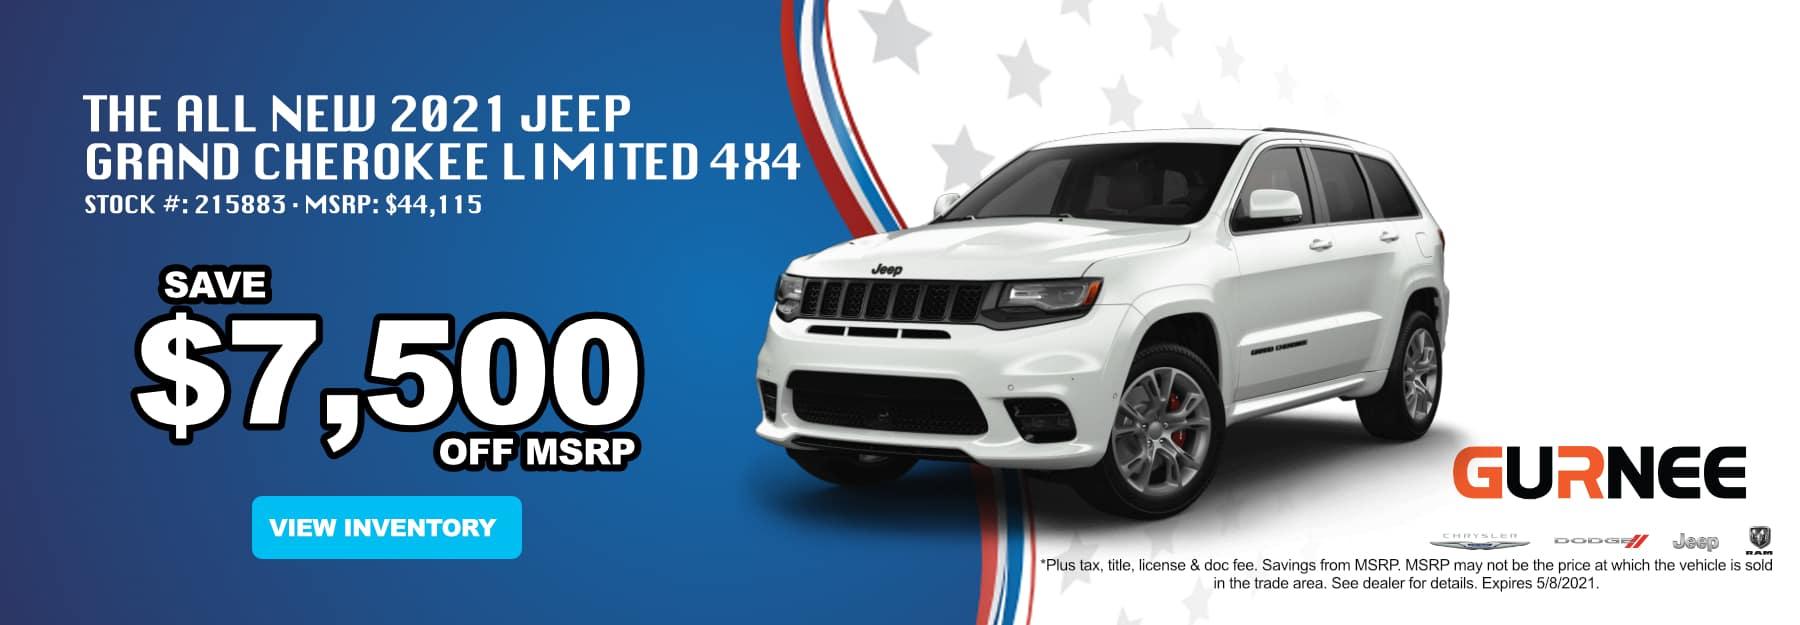 April_2021 Jeep Grand Cherokee_Gurnee